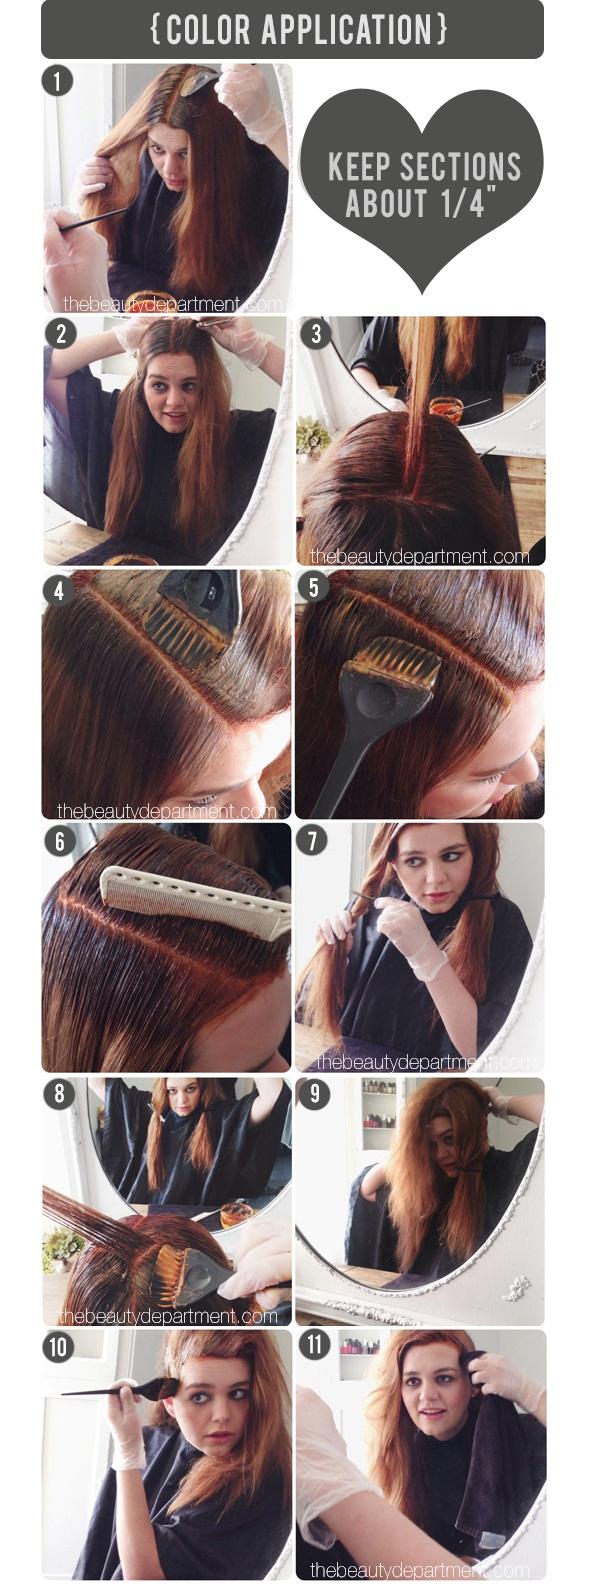 cara mewarnai rambut